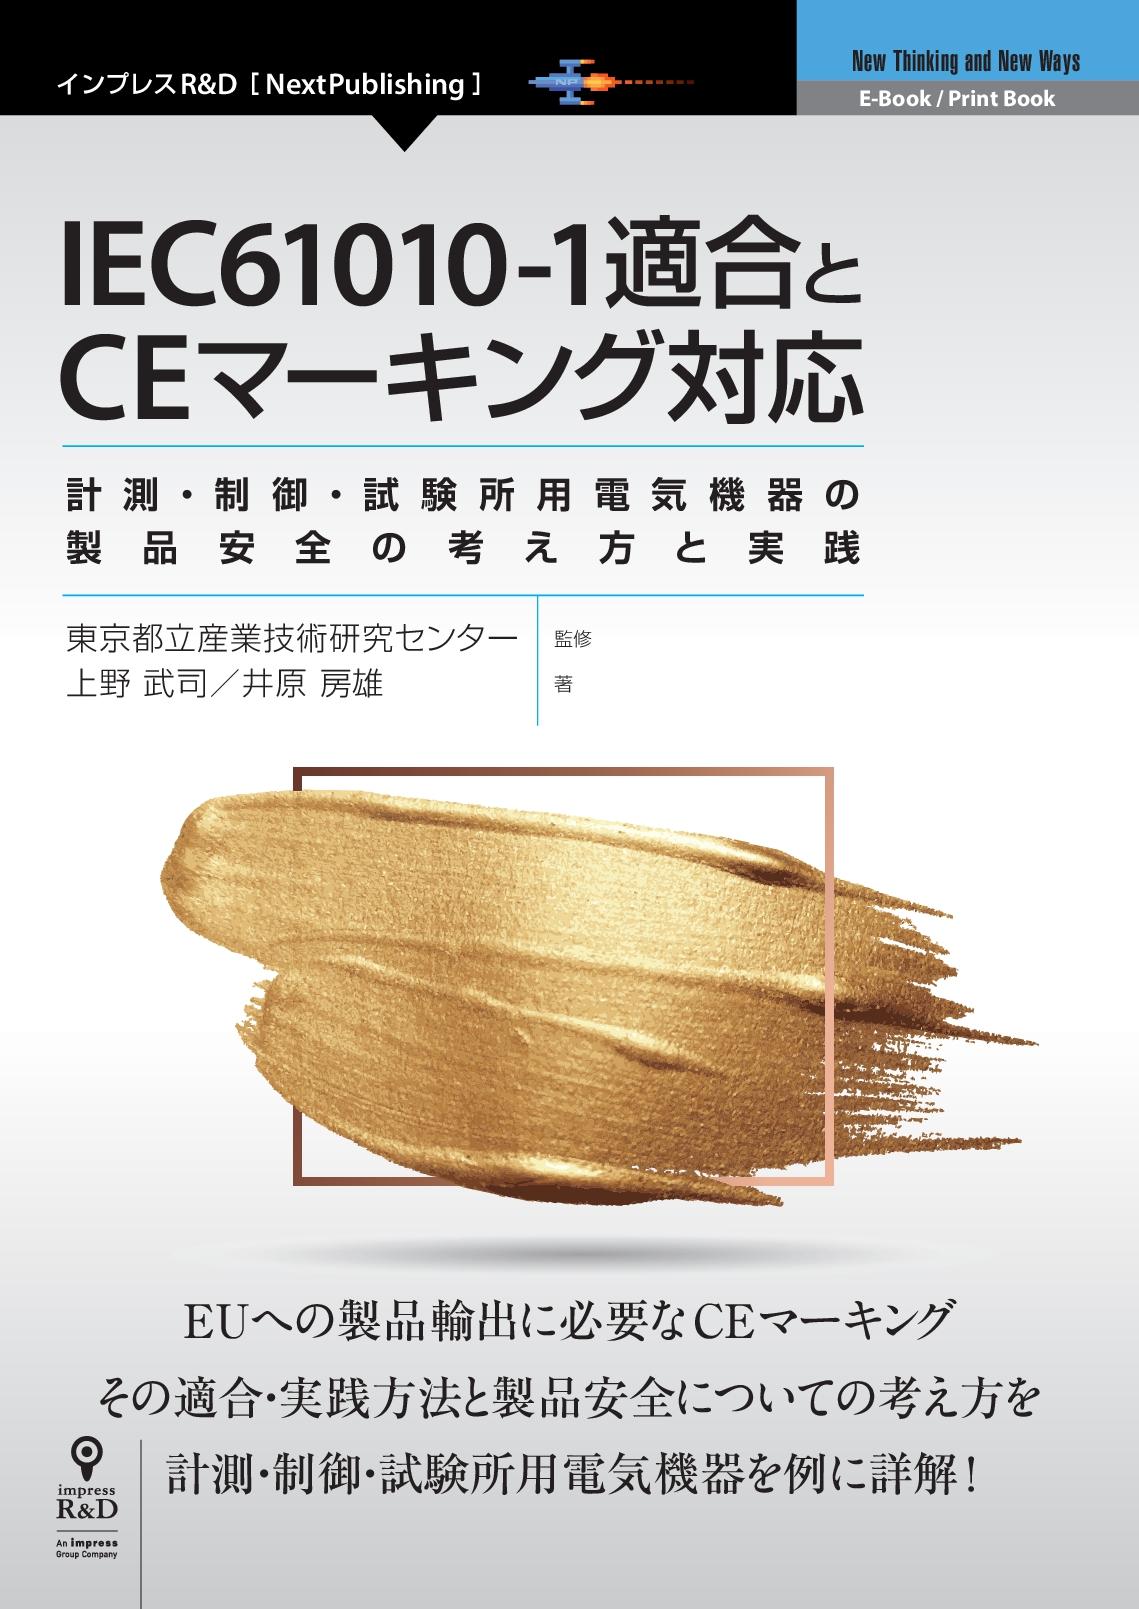 IEC61010-1適合とCEマーキング対応 計測・制御・試験所用電気機器の製品安全の考え方と実践